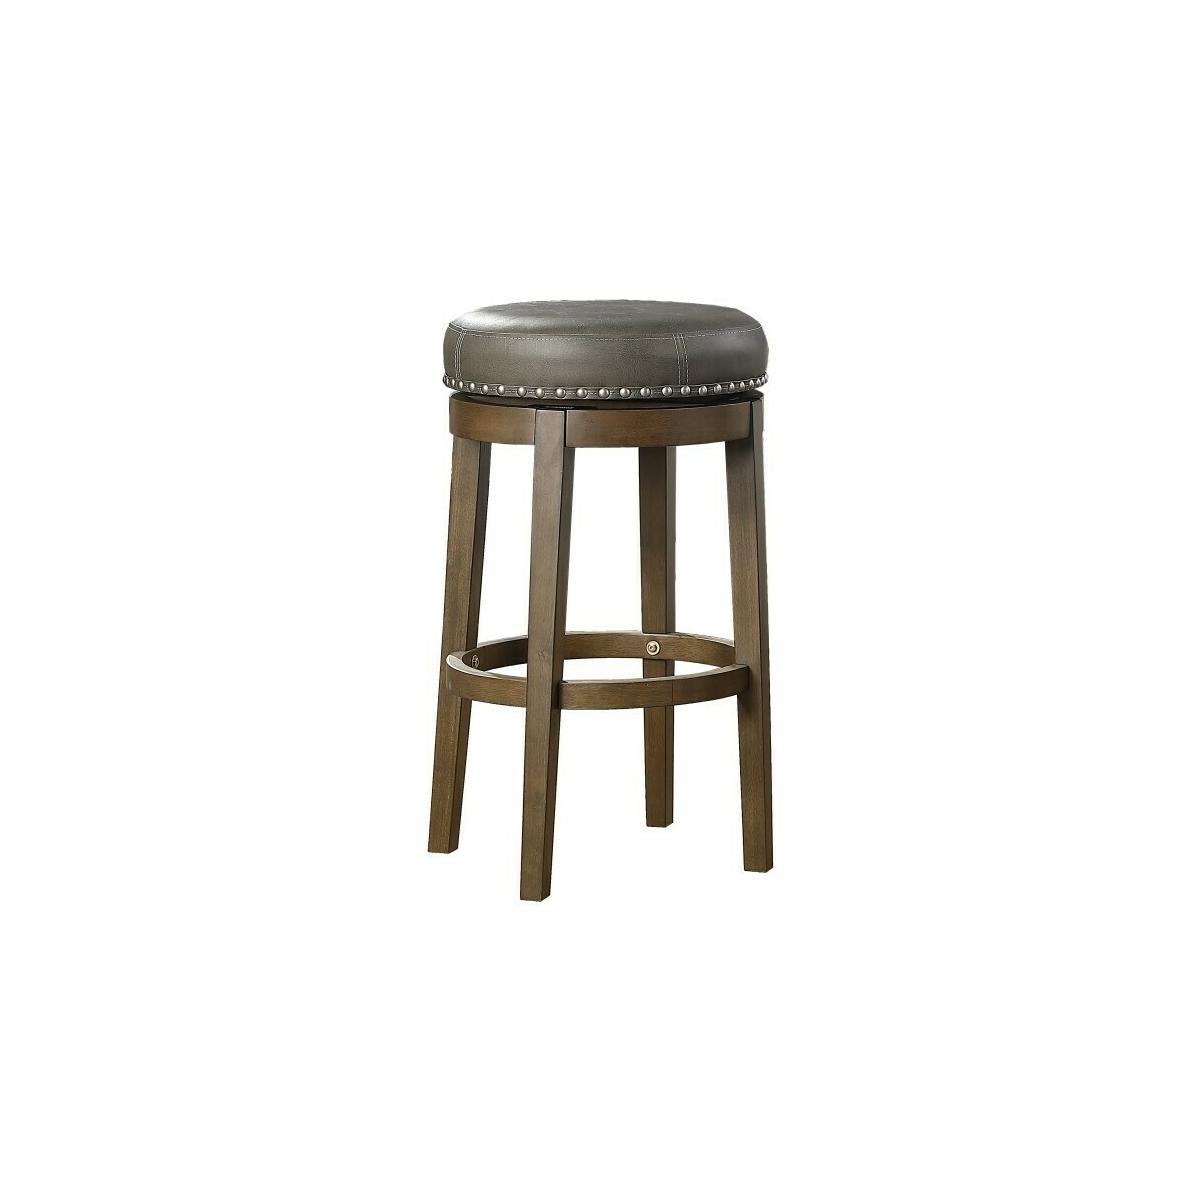 Round Swivel Pub Height Stool, Gray